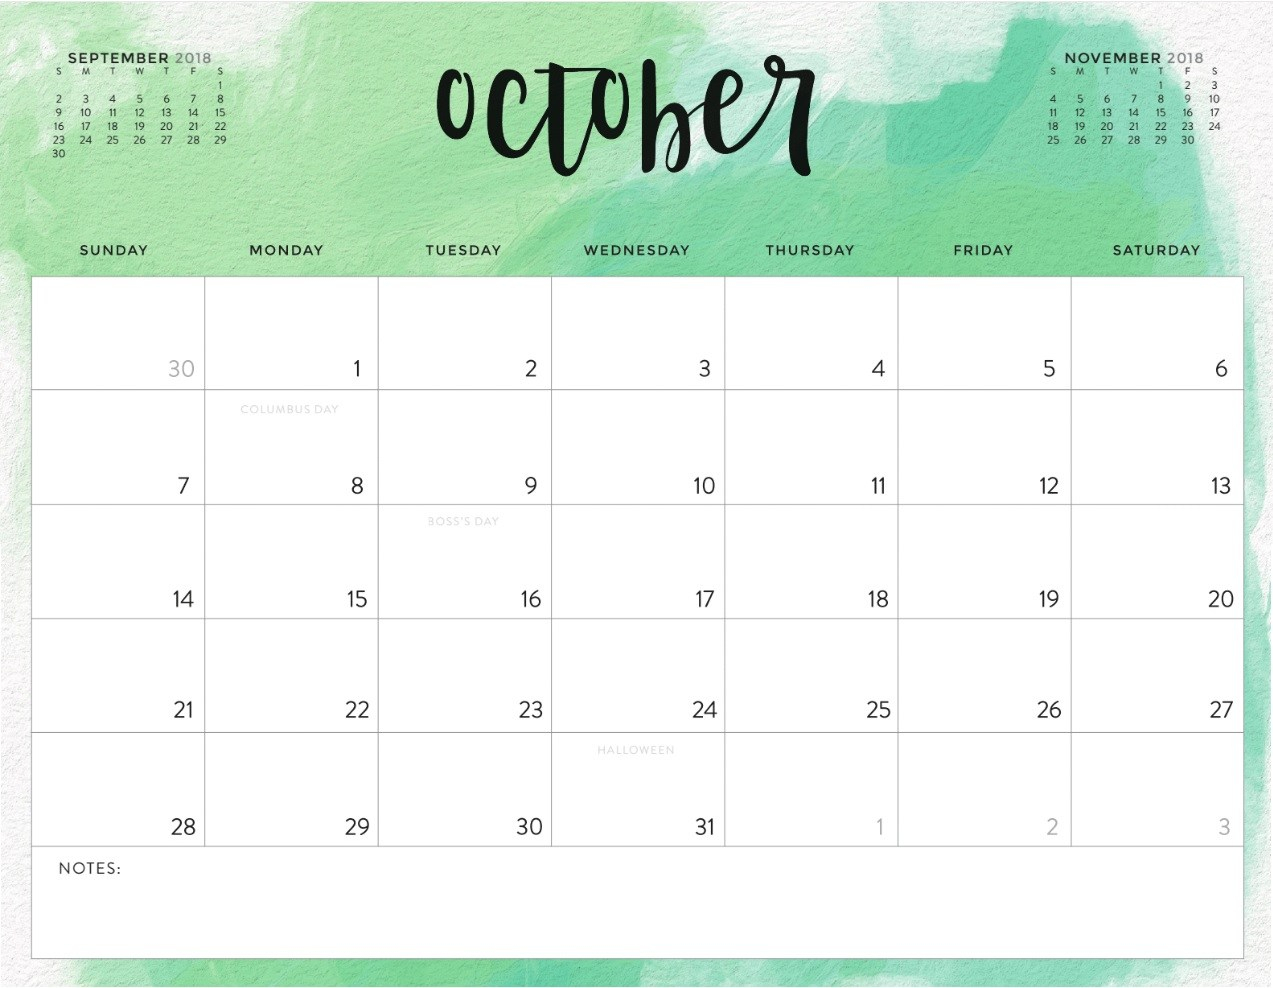 Free October 2018 Calendar In Printable Format Templates - Calendar inside October Calendar Printable Template